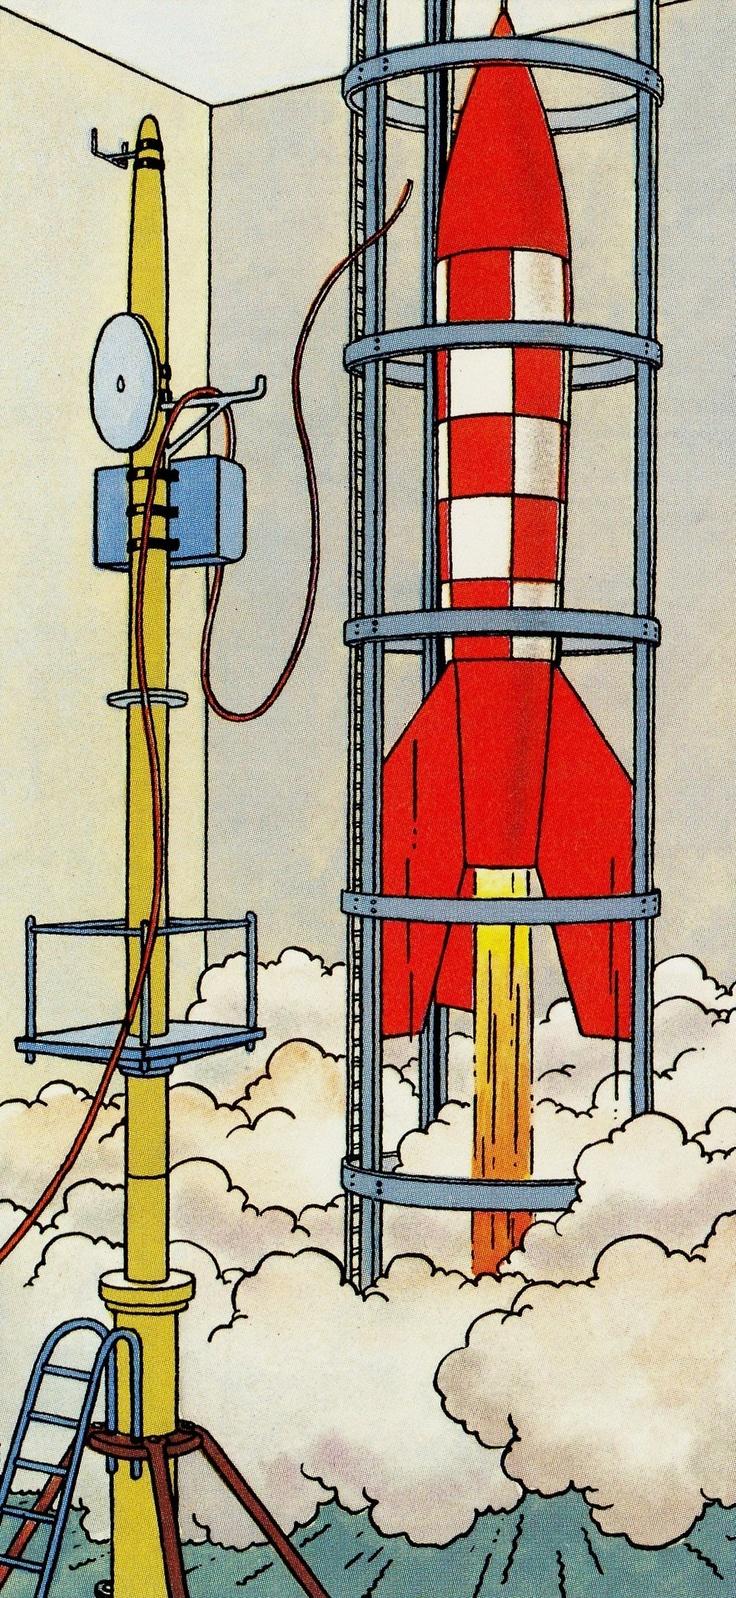 Hergé - From Tintin magazine 1952, April 23